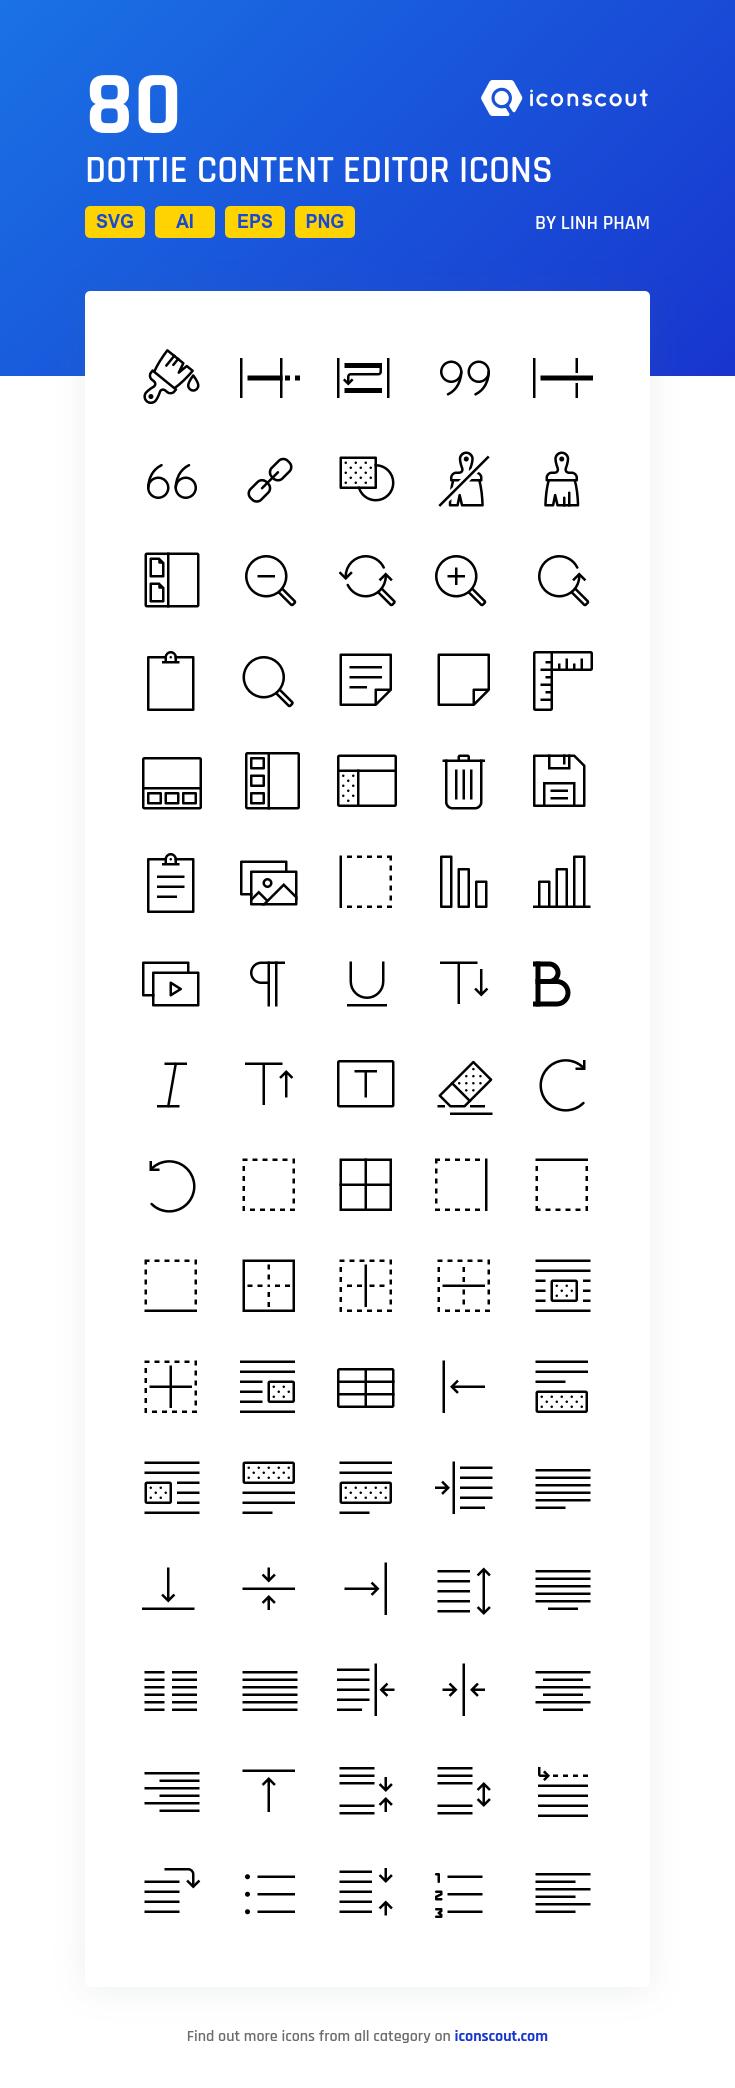 Dottie Content Editor Icon Pack 80 Line Icons 아이콘